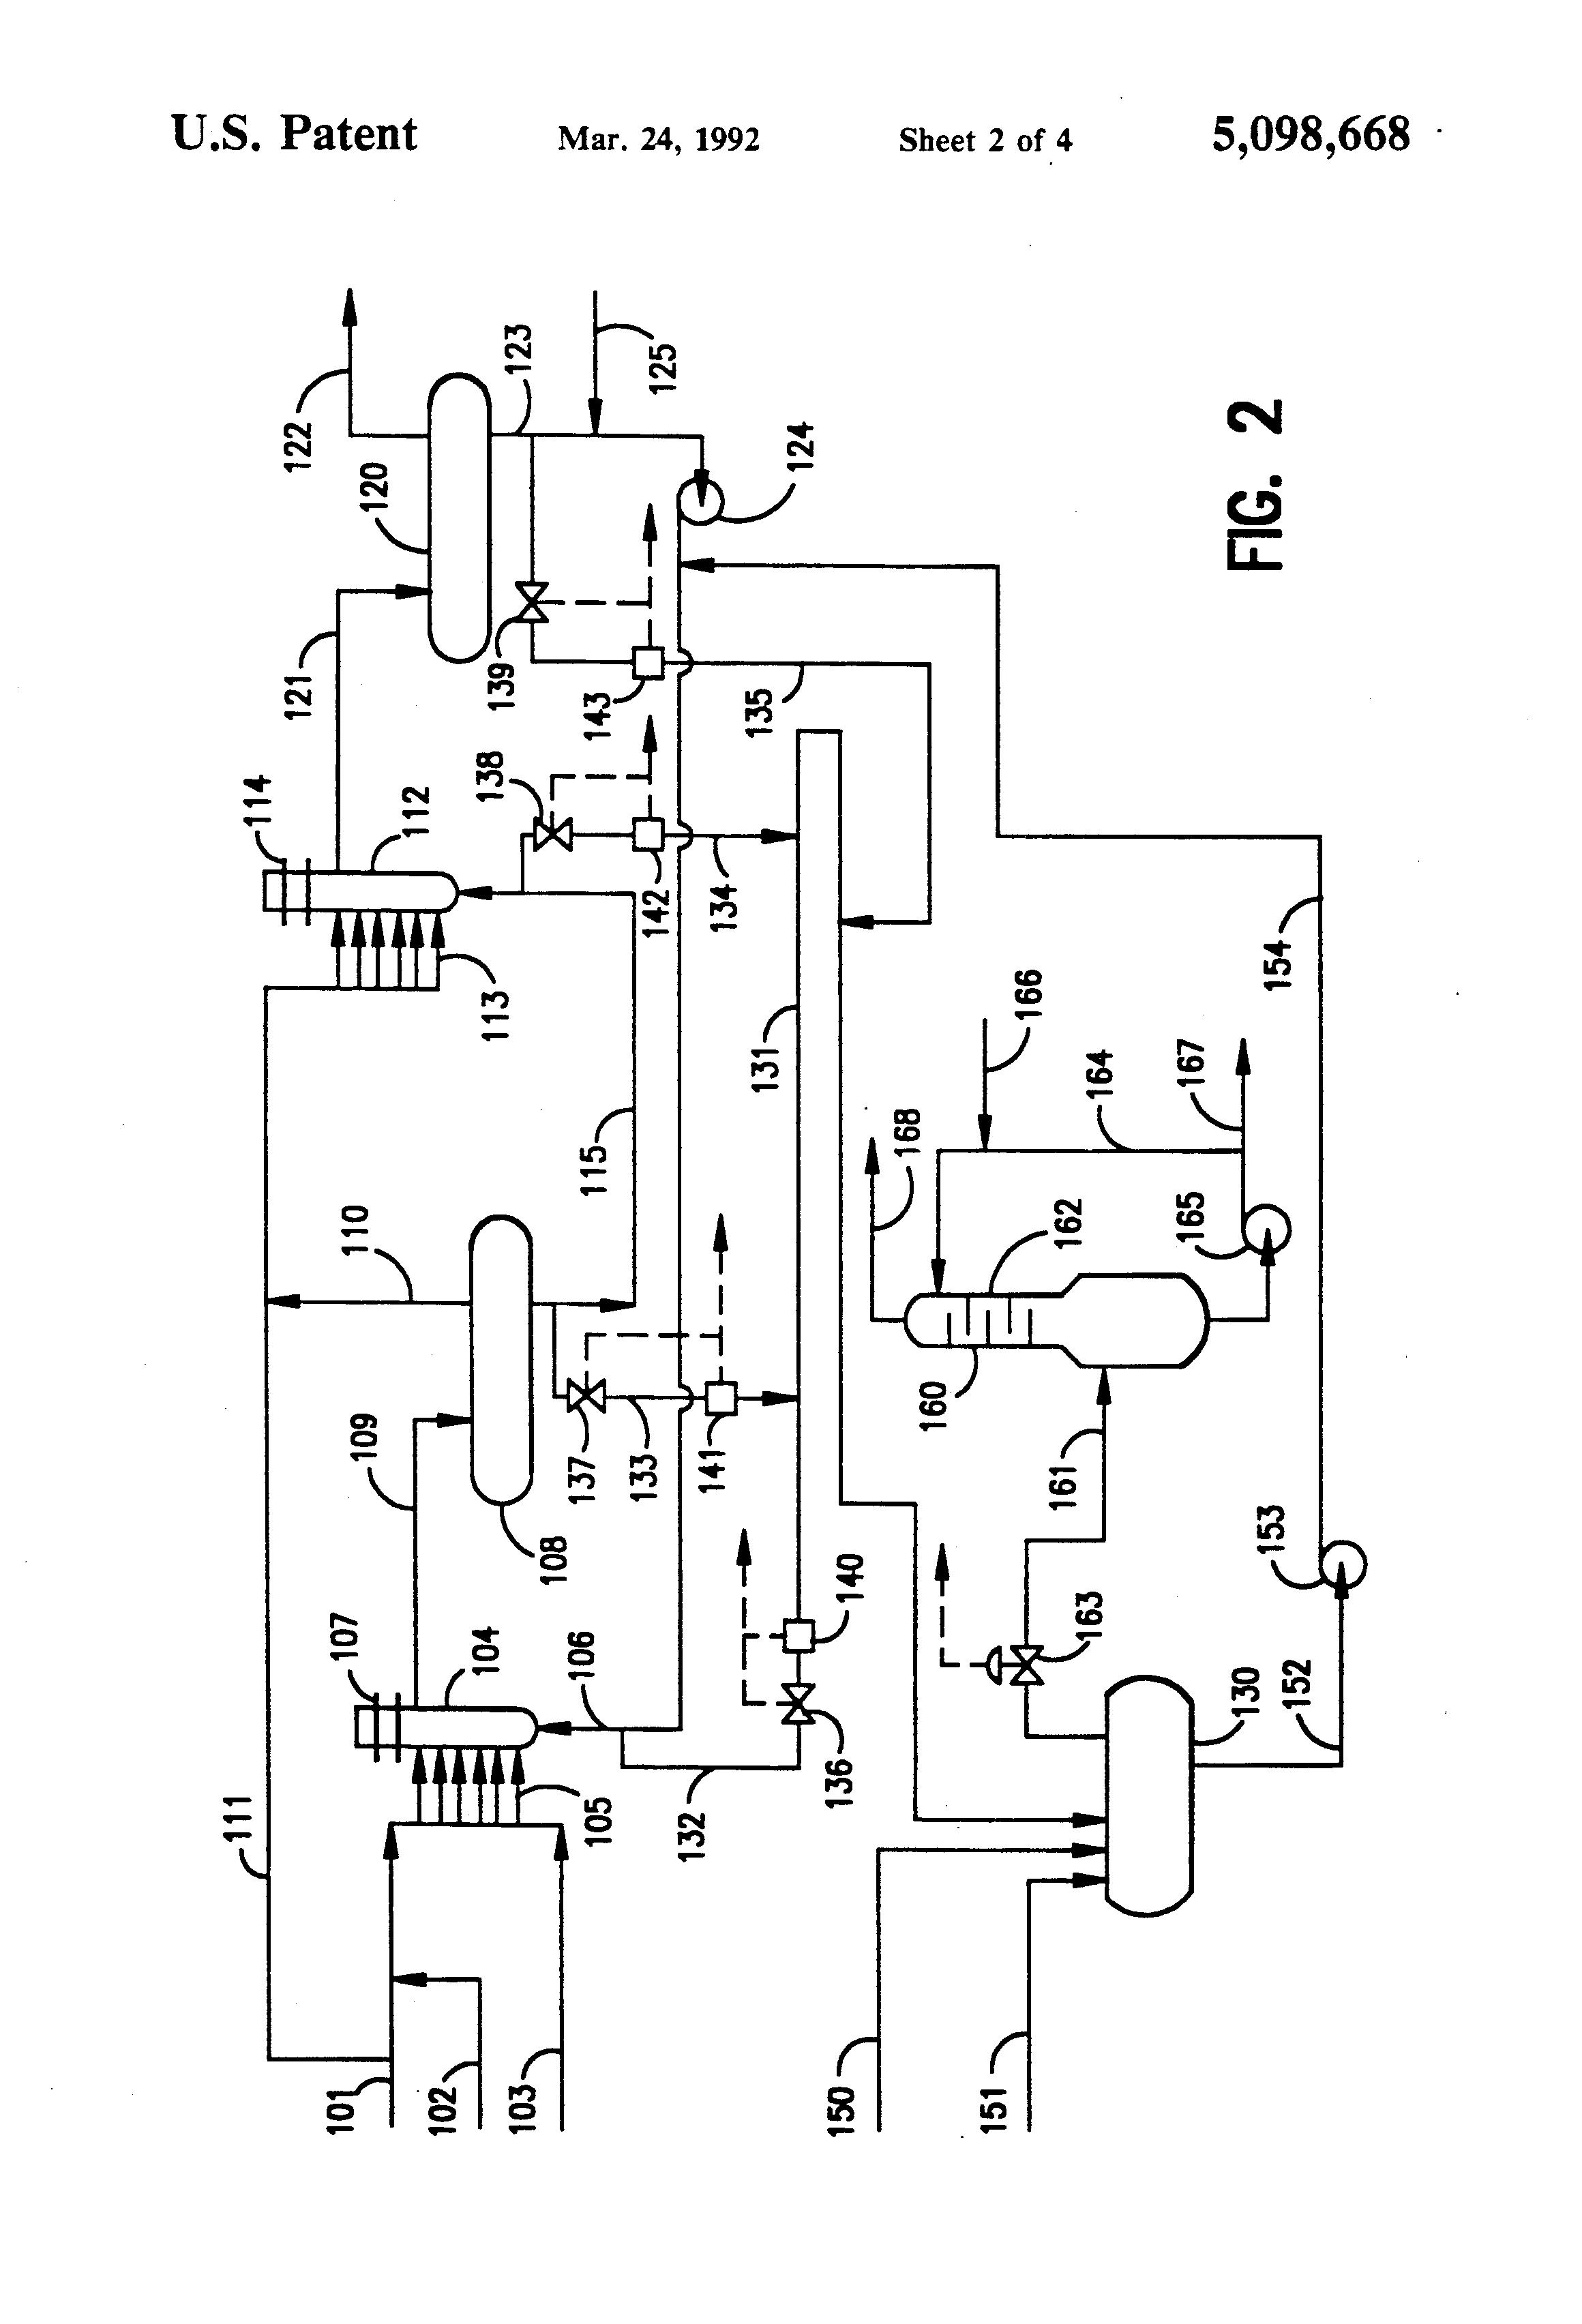 patent us5098668 - hf alkylation unit with acid evacuation system